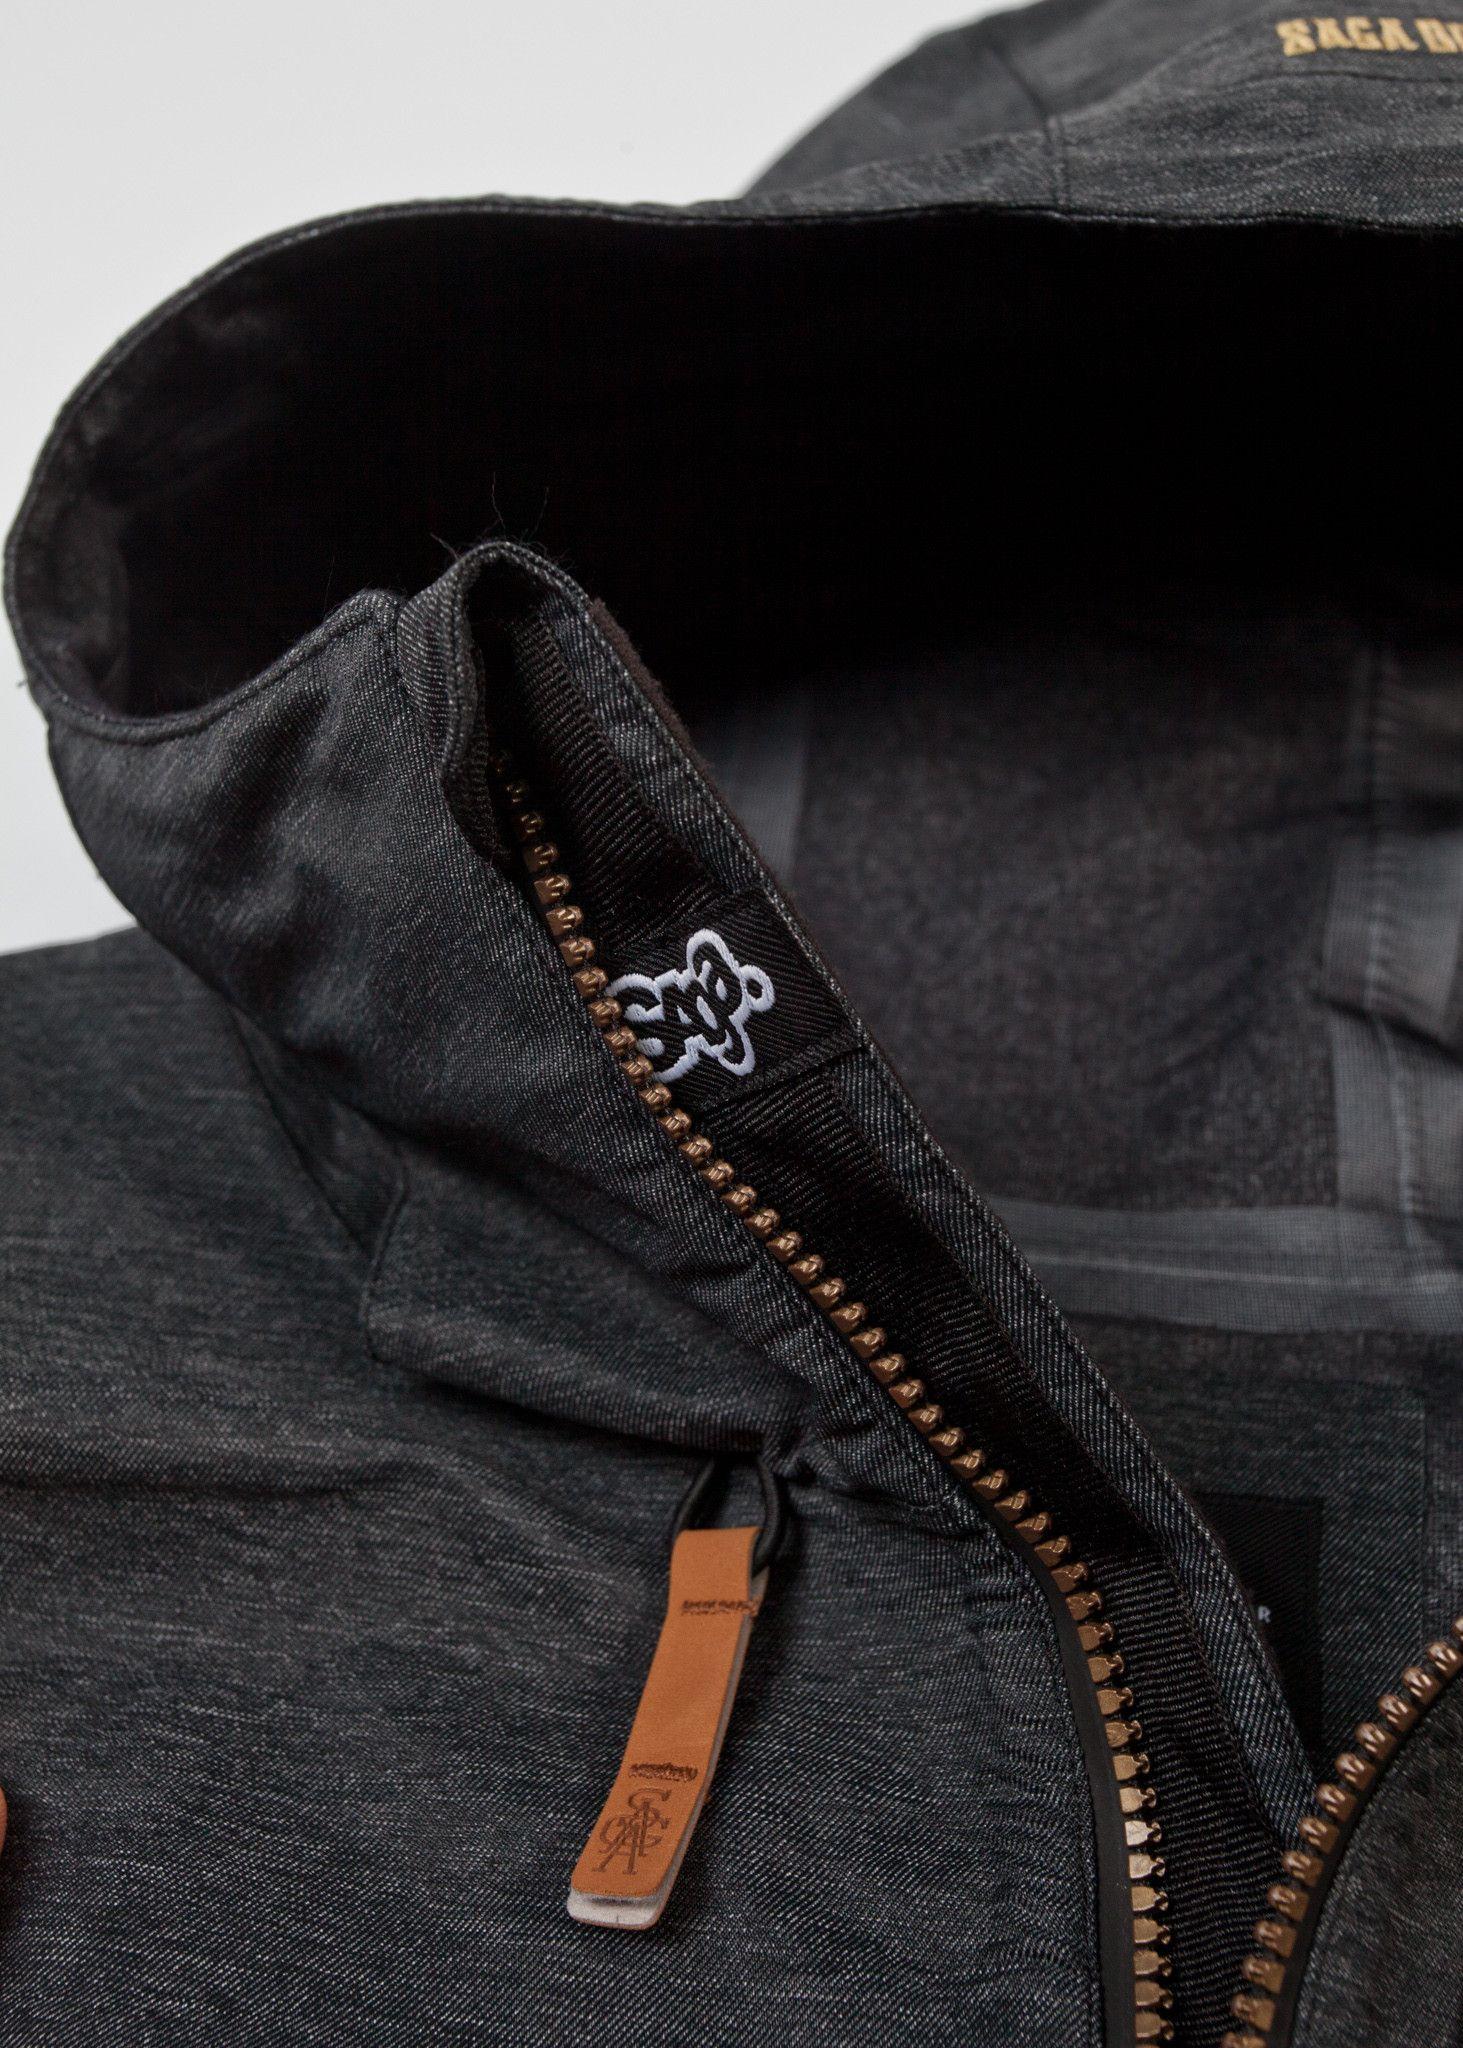 512150c9e Monarch 3L Jacket – Saga Outerwear Online Store